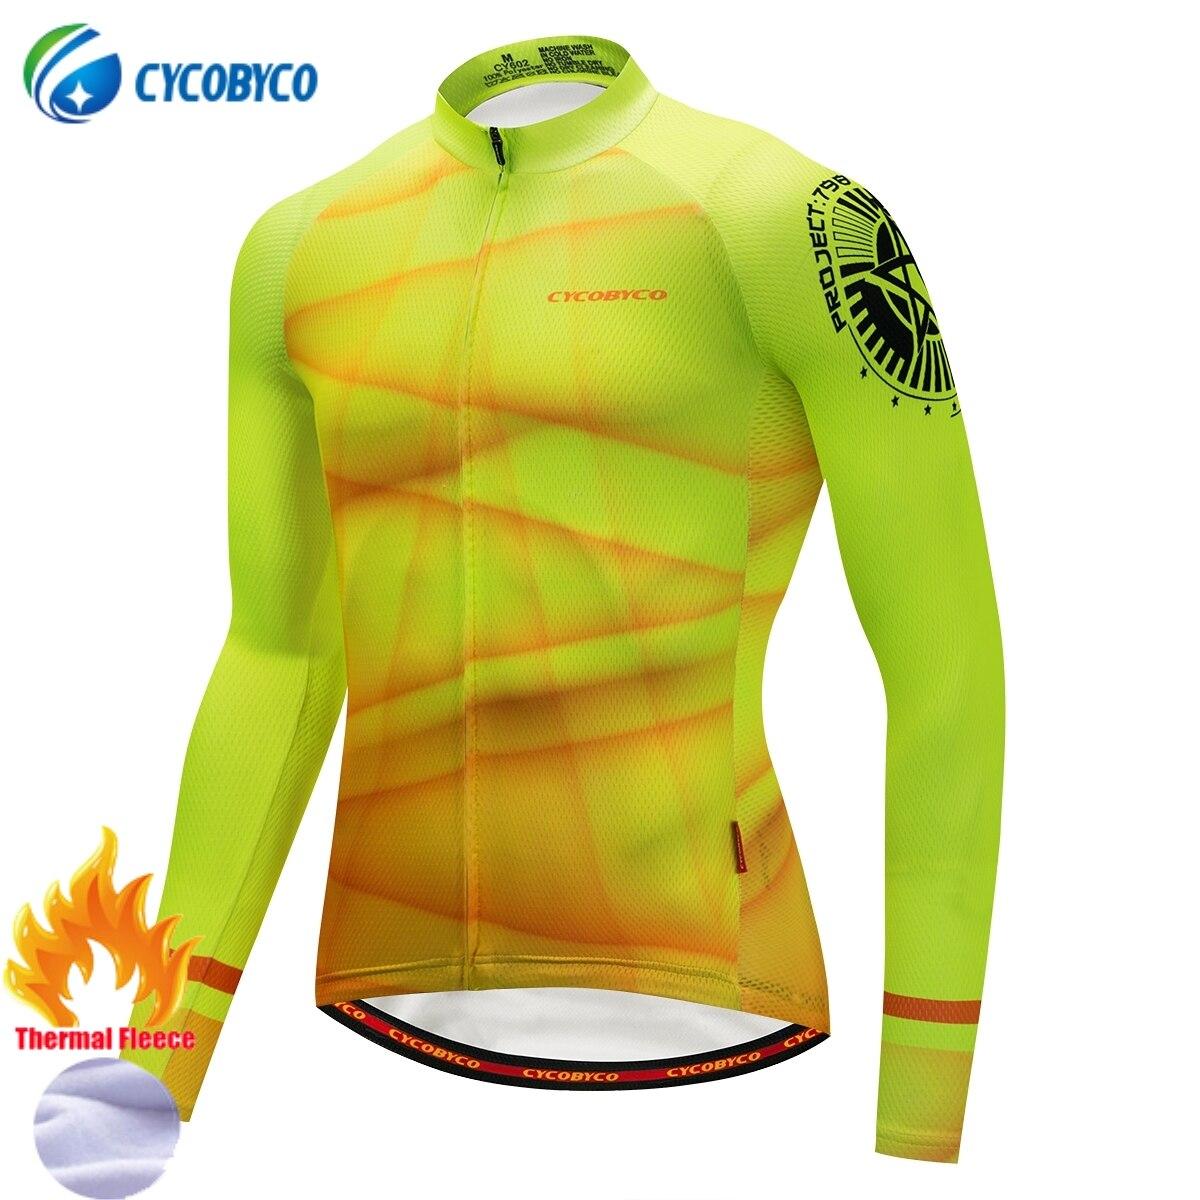 Cycobyco, Jersey de Ciclismo, ropa de Invierno para bicicleta de manga larga, ropa térmica de lana, ropa de Ciclismo para Hombre, ropa para bicicleta MTB